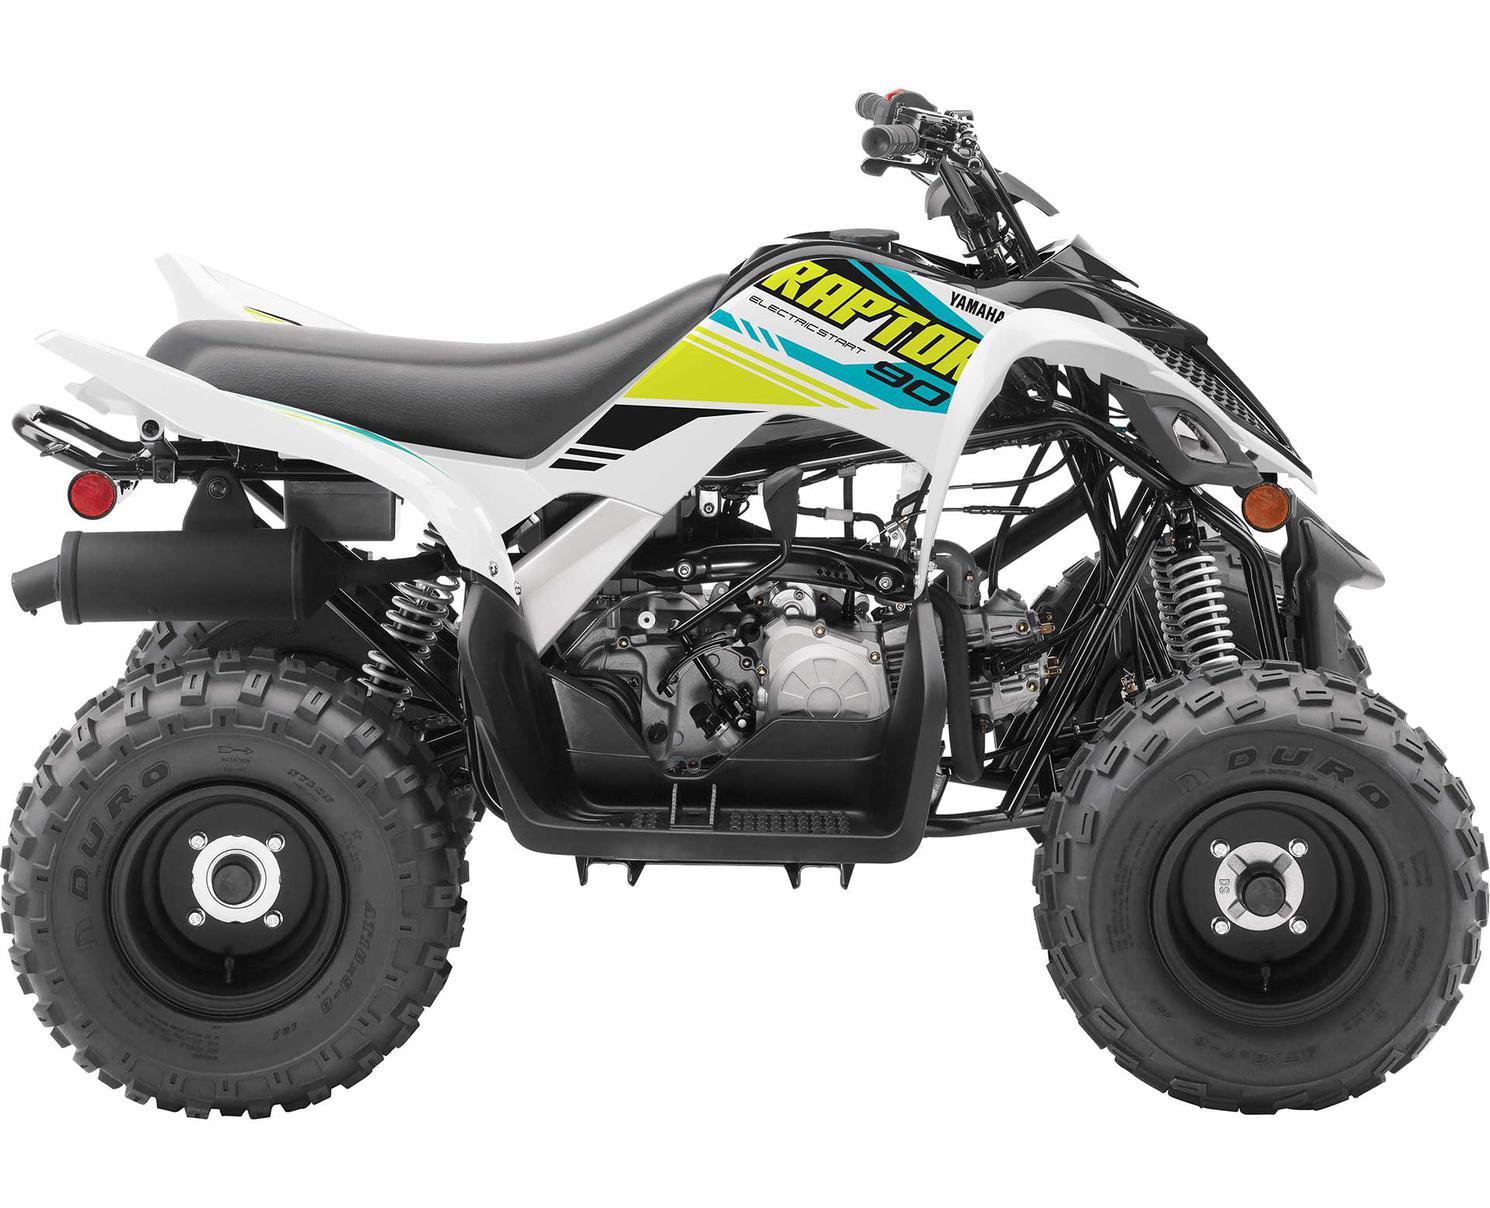 2021 Yamaha Raptor 90 White-Tan